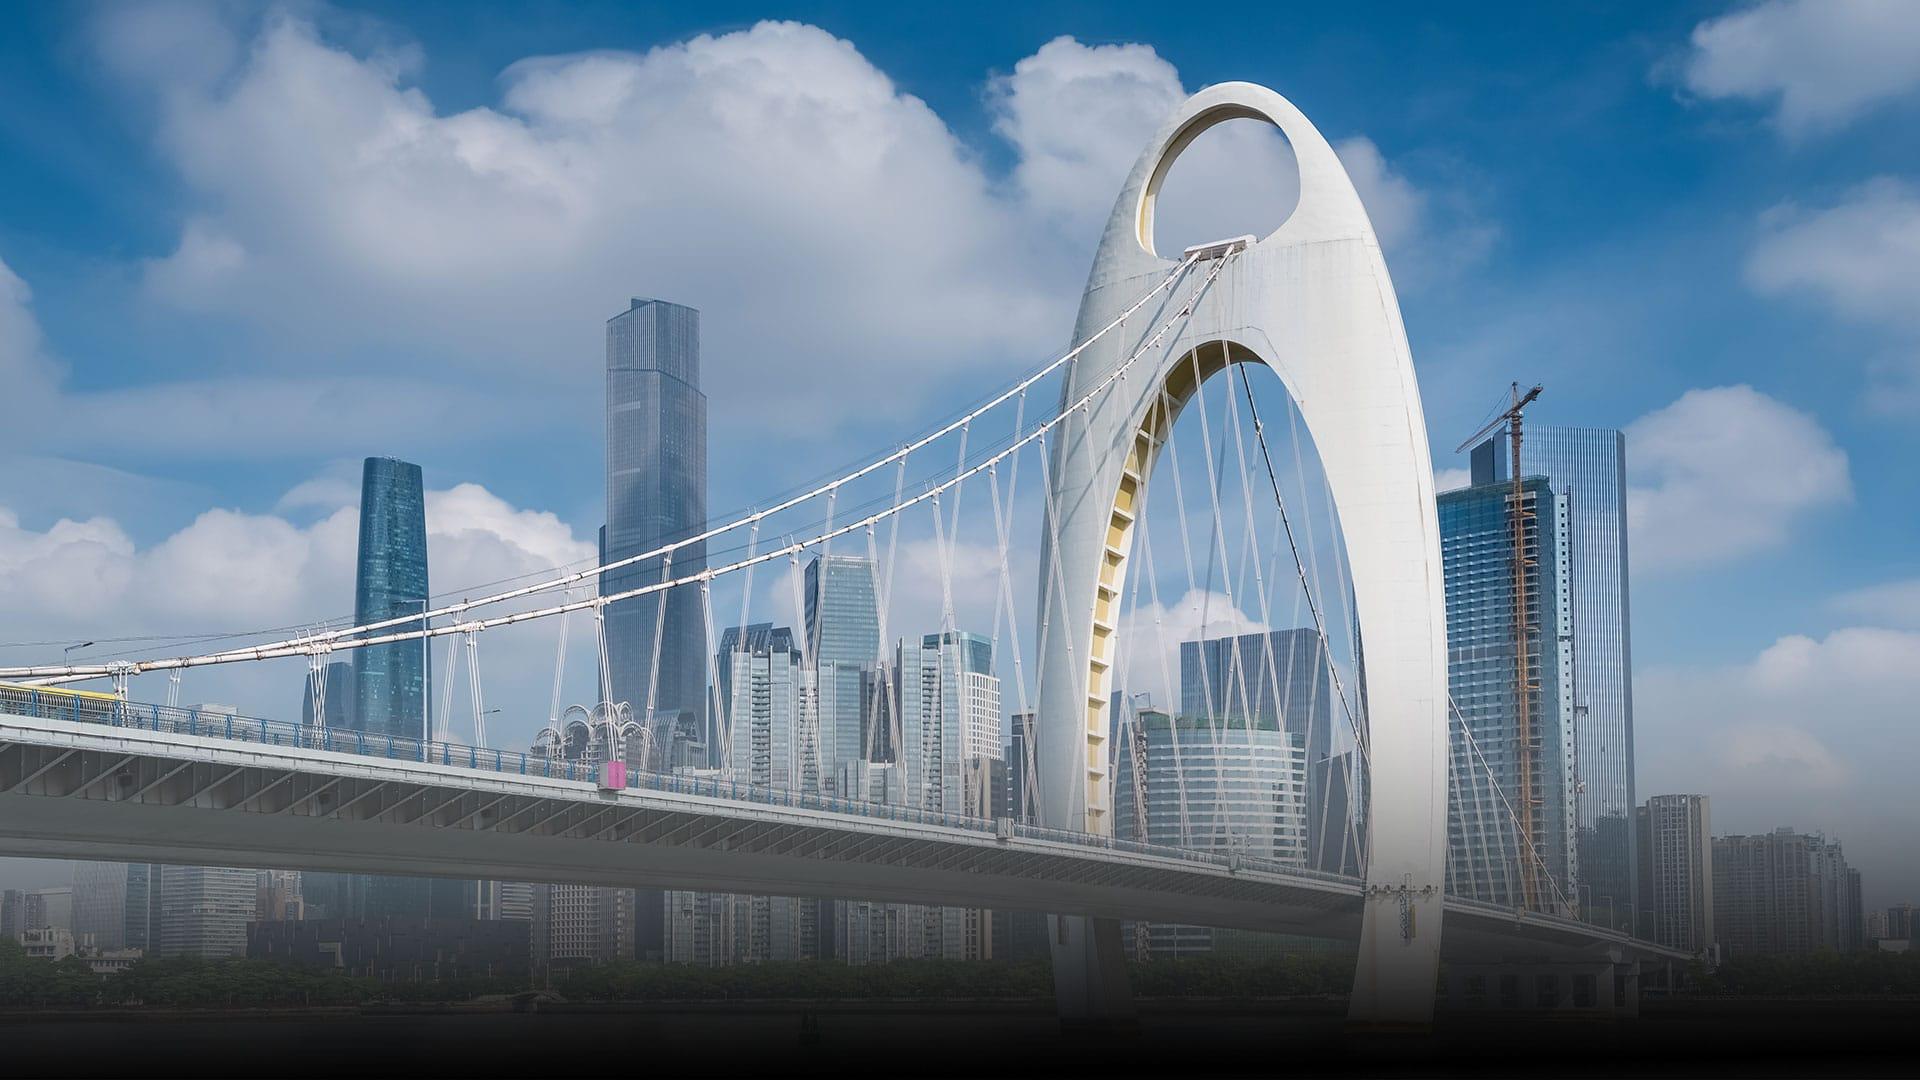 starters-united-agence-de-creation-et-developpement-franchise-et-marque-world-guangzhou